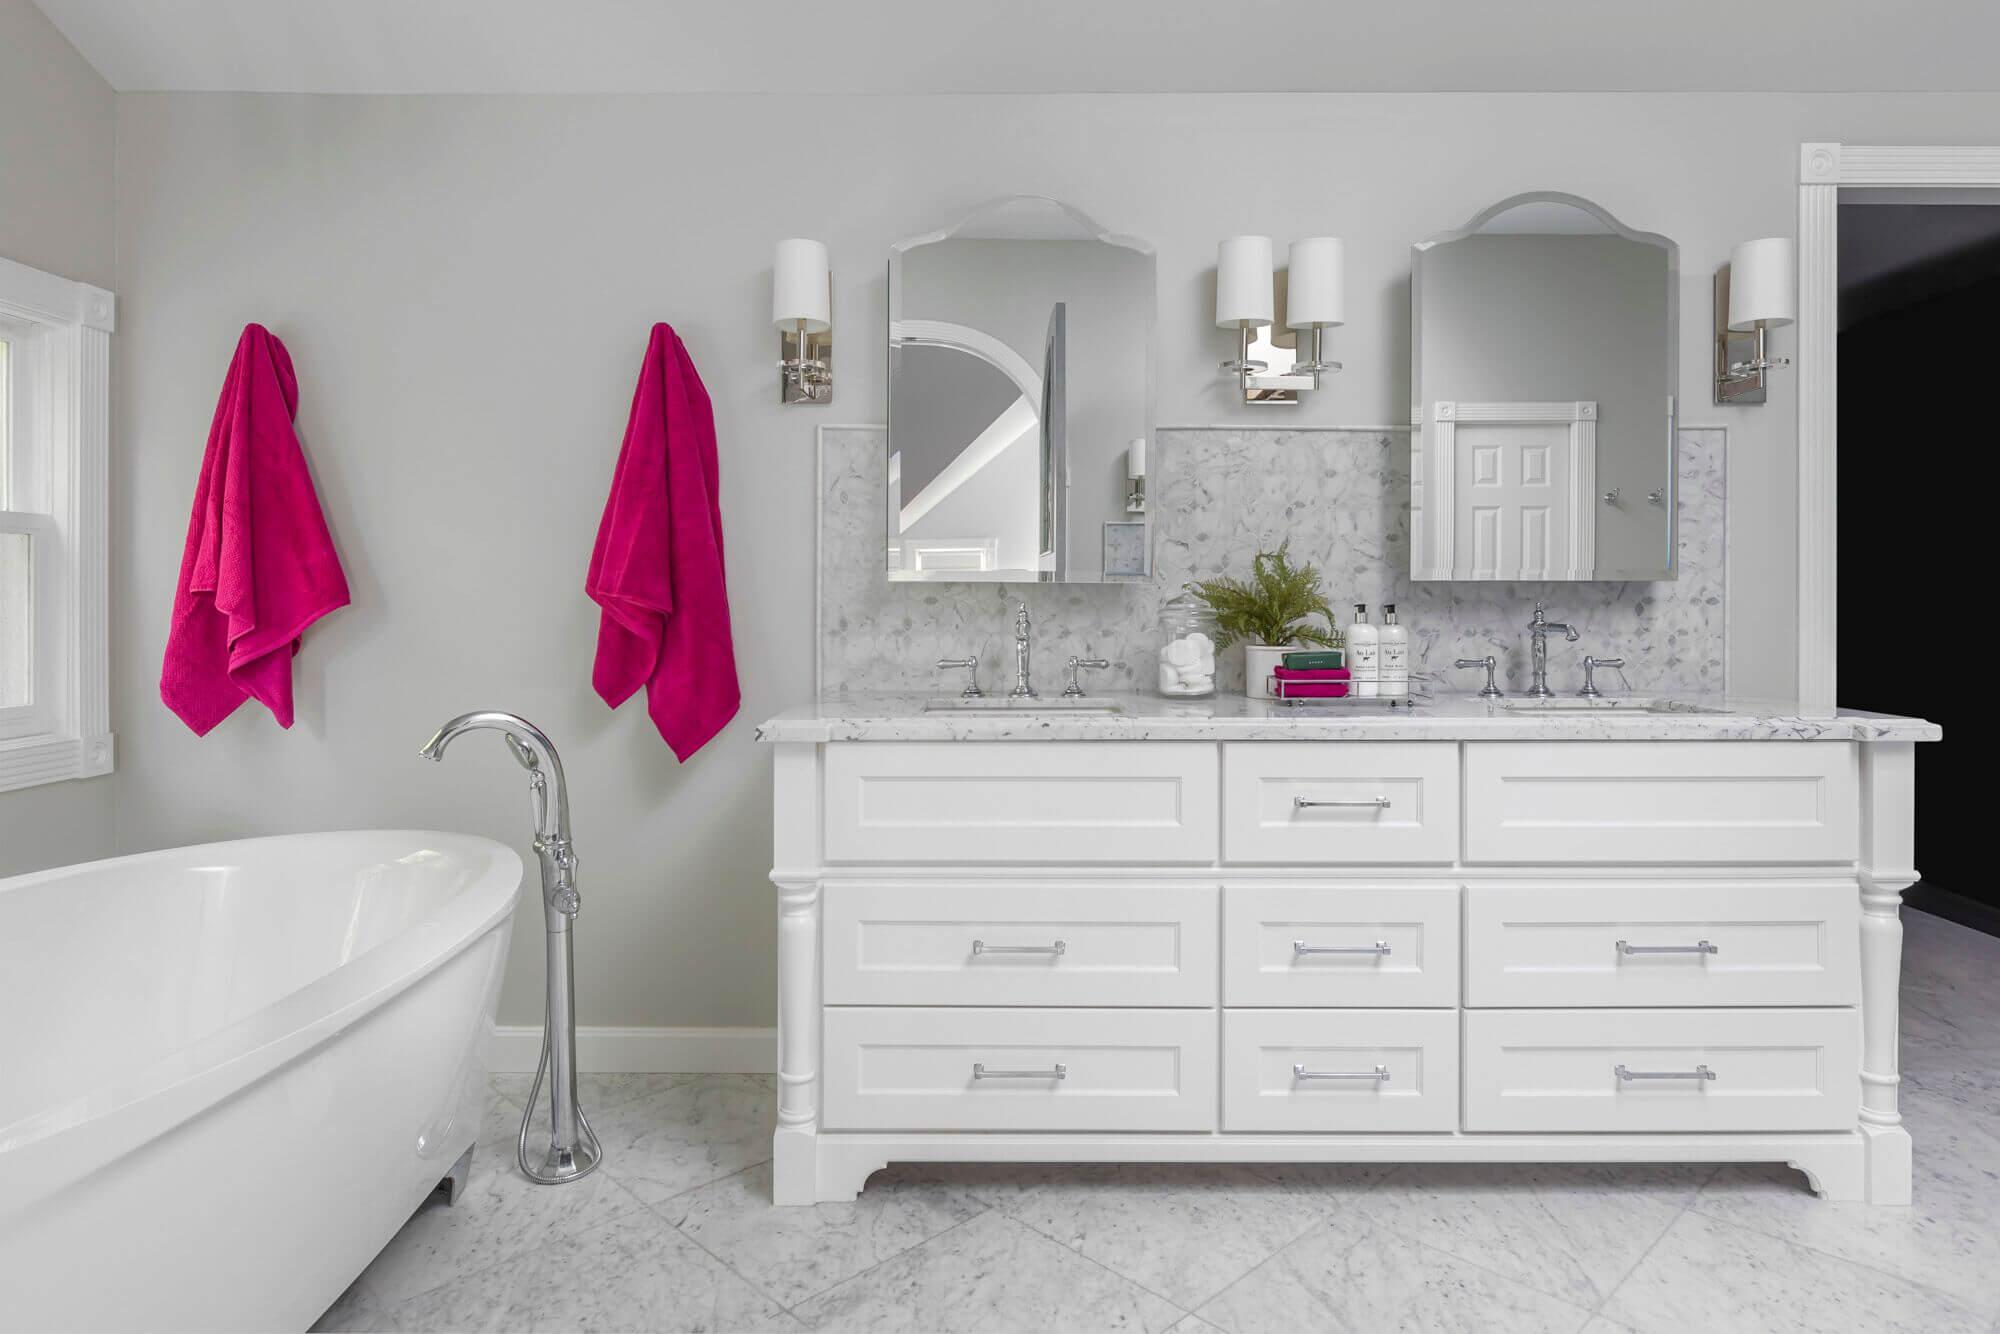 Bathroom Remodel Design Trends